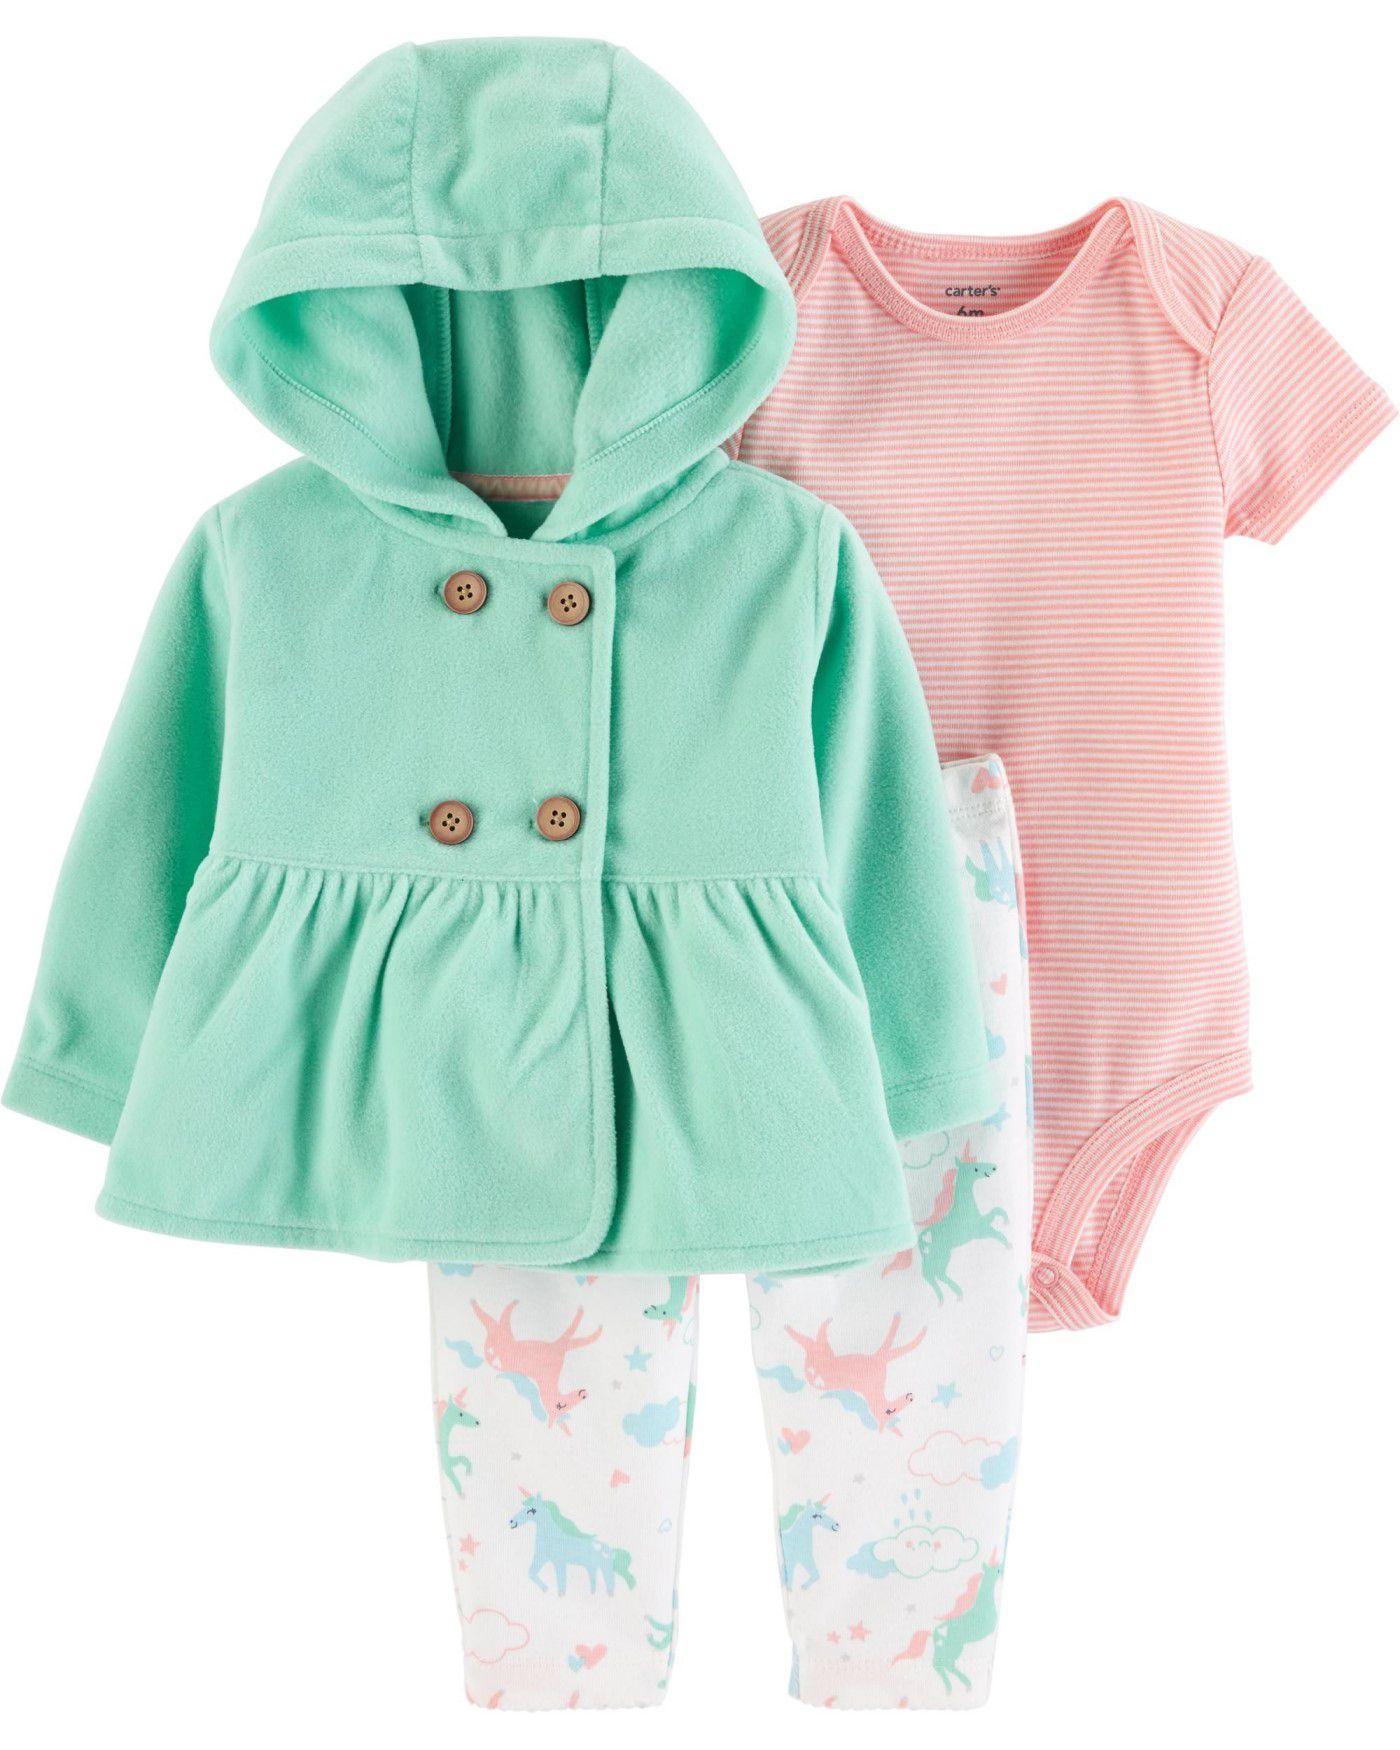 Conjunto Carter's Fleece Verde Girl Unicornio